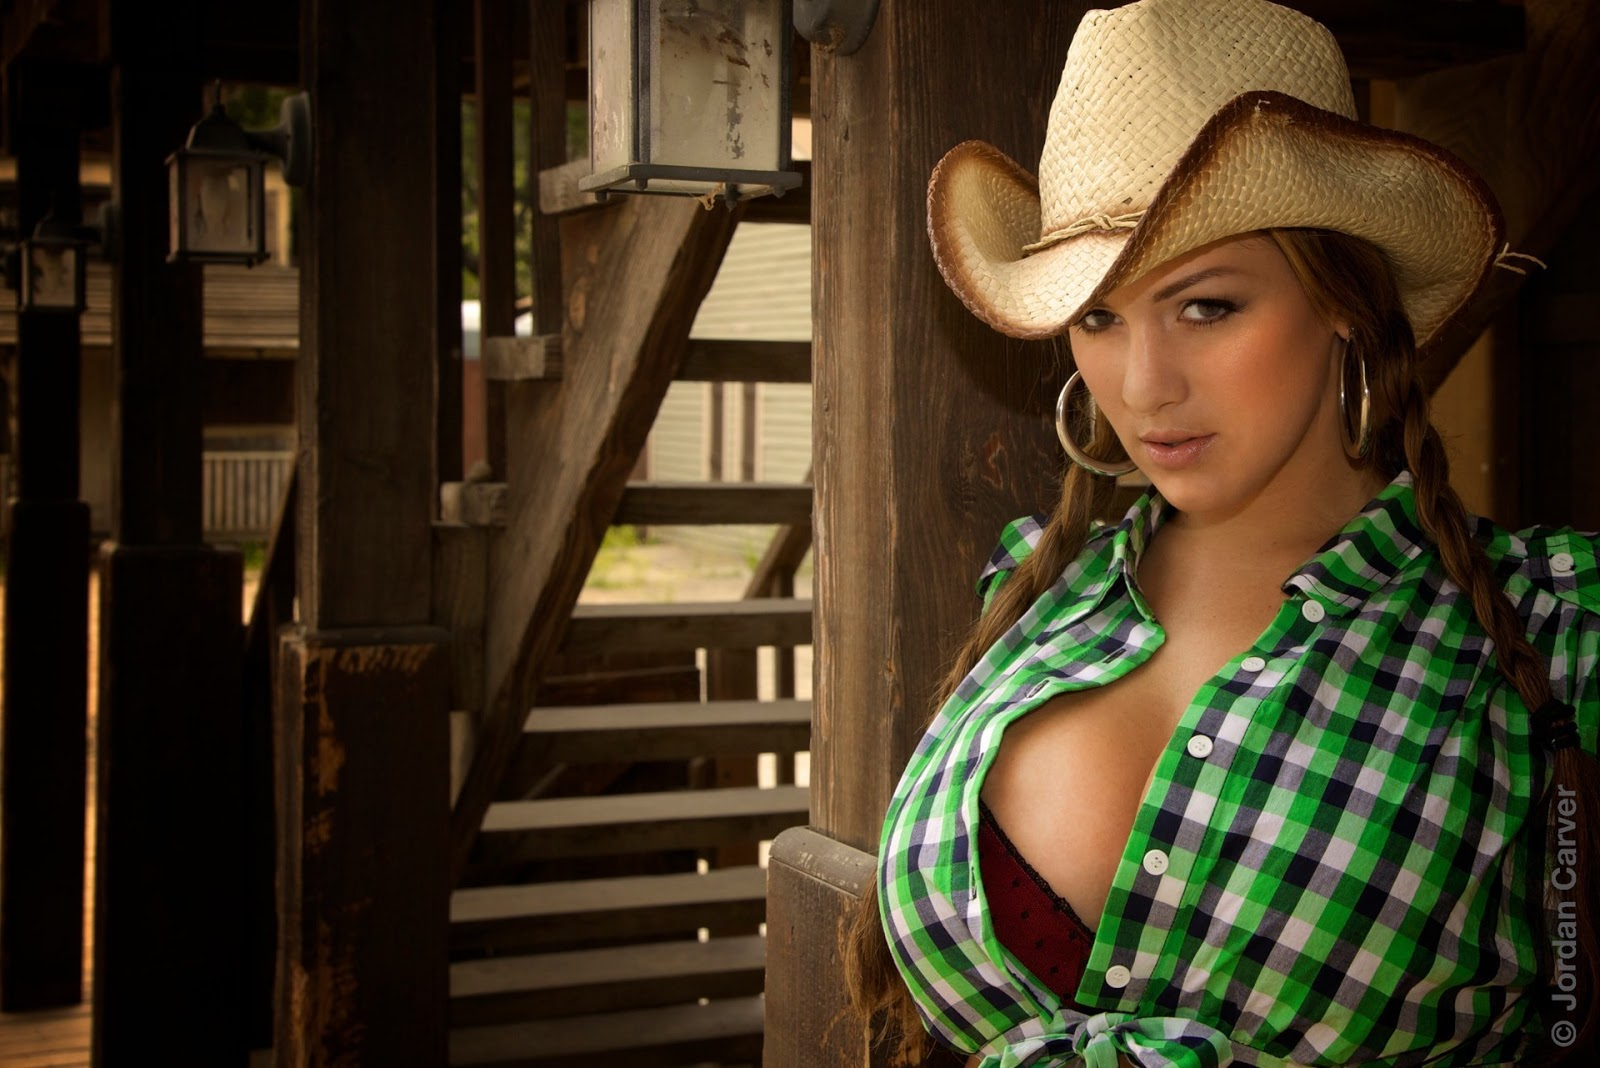 Boy And Girl Wallpaper Full Hd Jordan Carver Cowgirl Hot Sexy Photo Shoot Damn Sexy